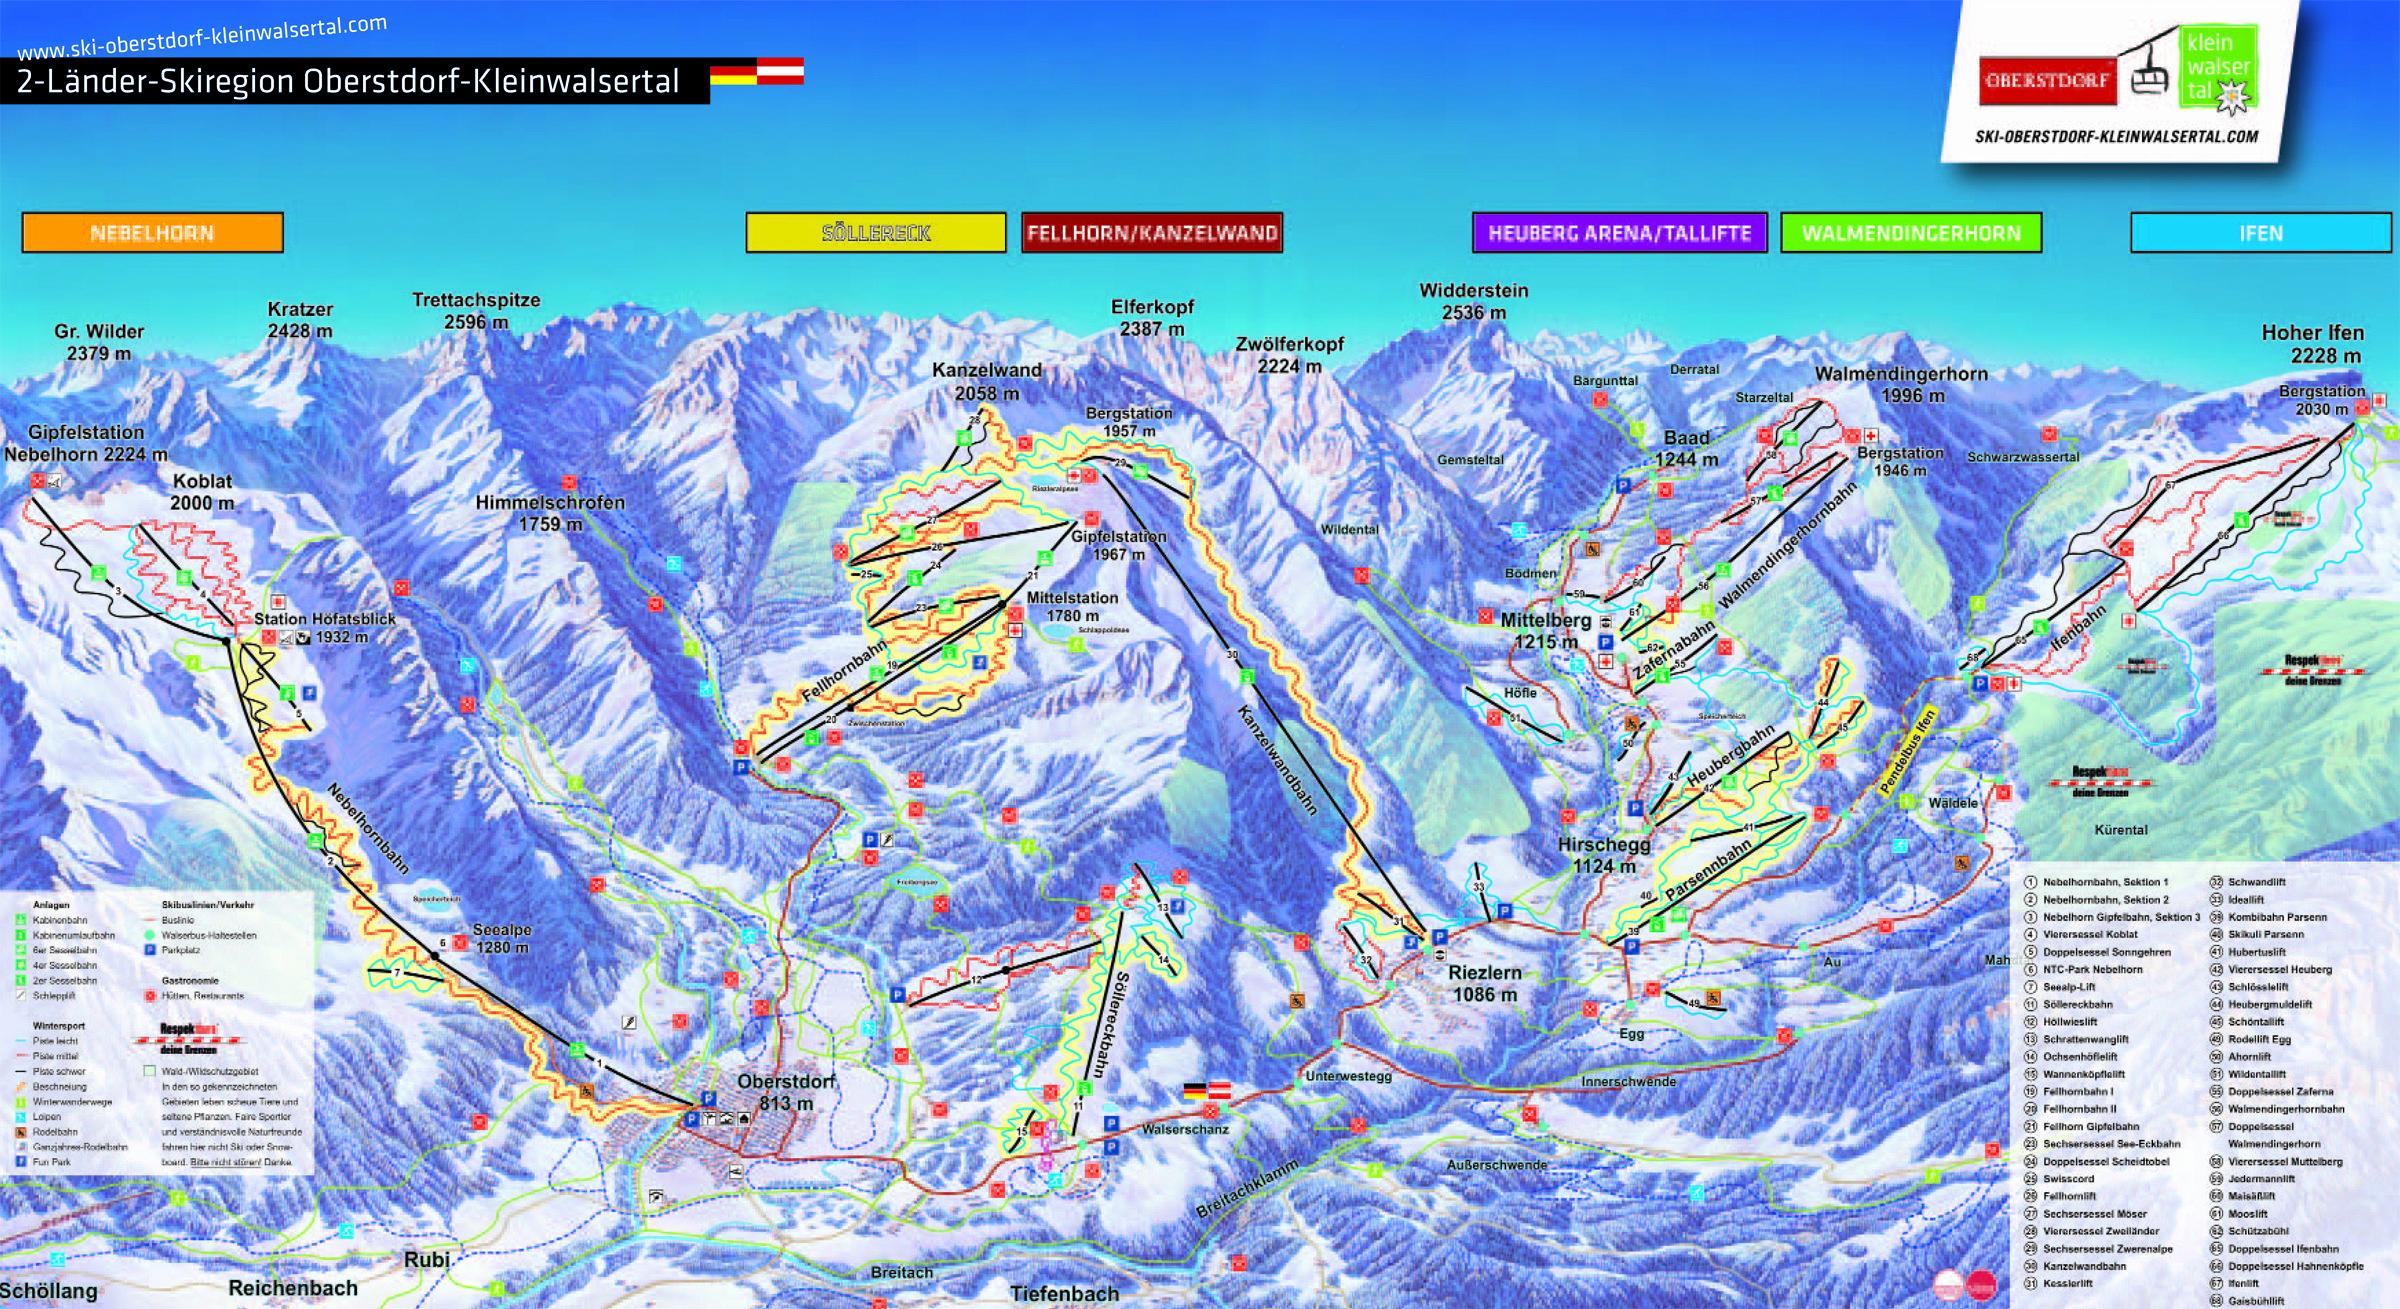 2 Lander Ski Region Oberstdorf Kleinwalsertal Kleinwalsertal